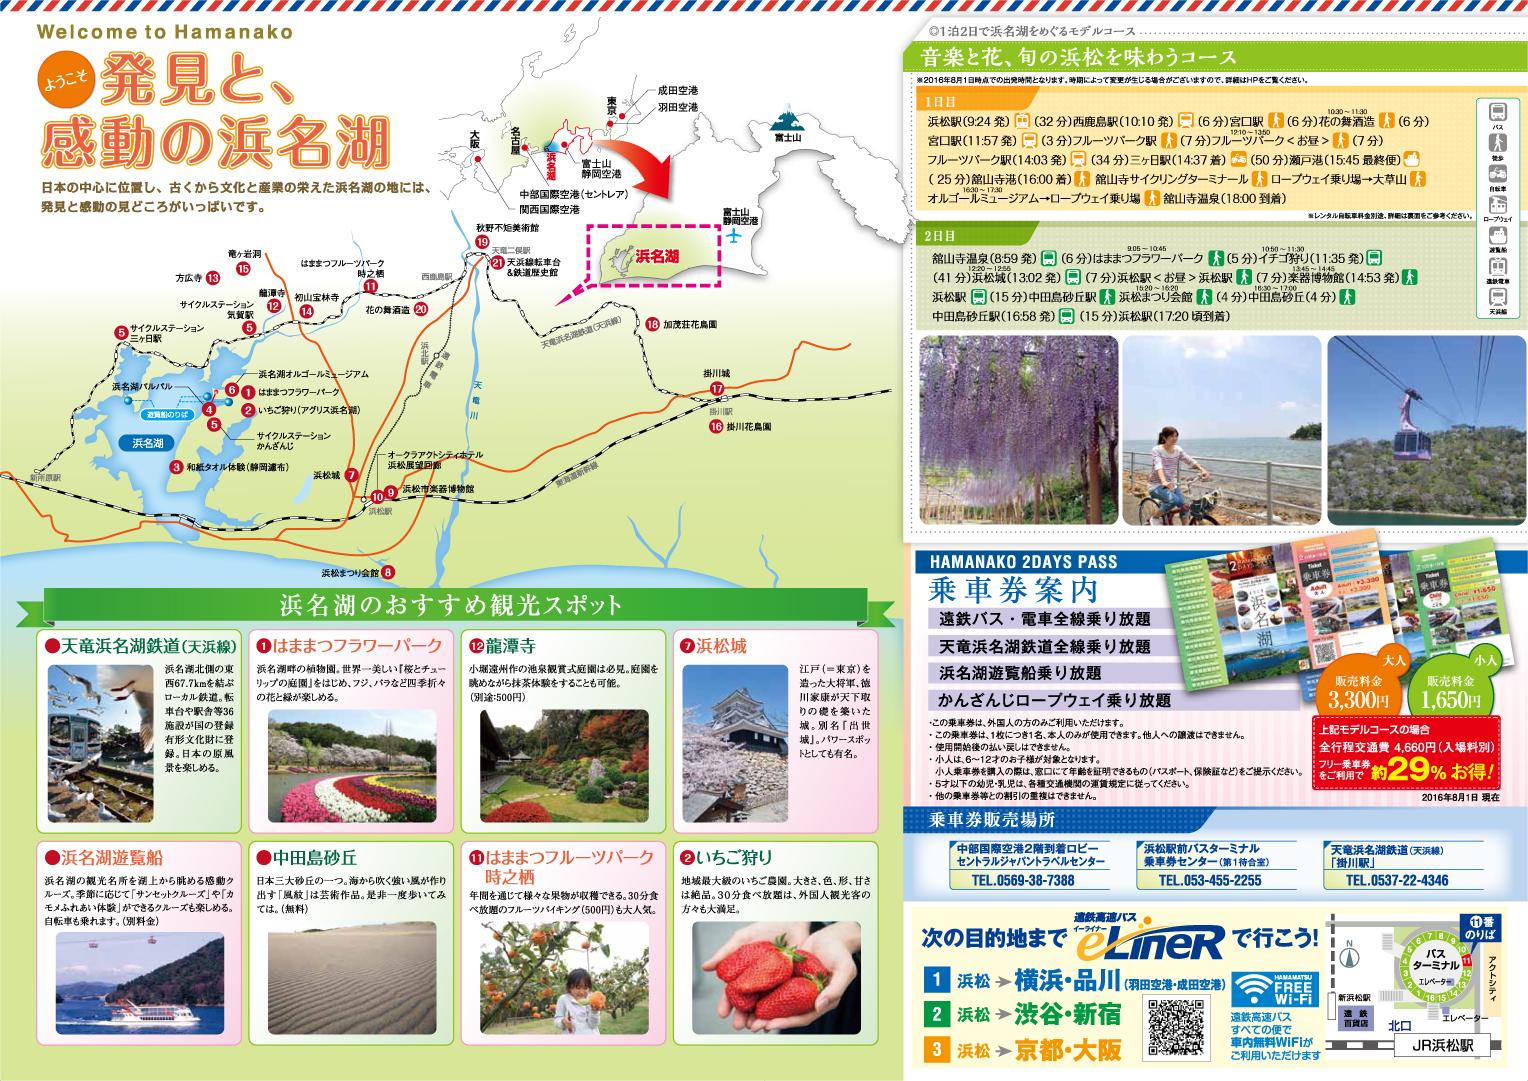 http://www.inhamamatsu.com/recommend/hnkrp2_ura.jpg